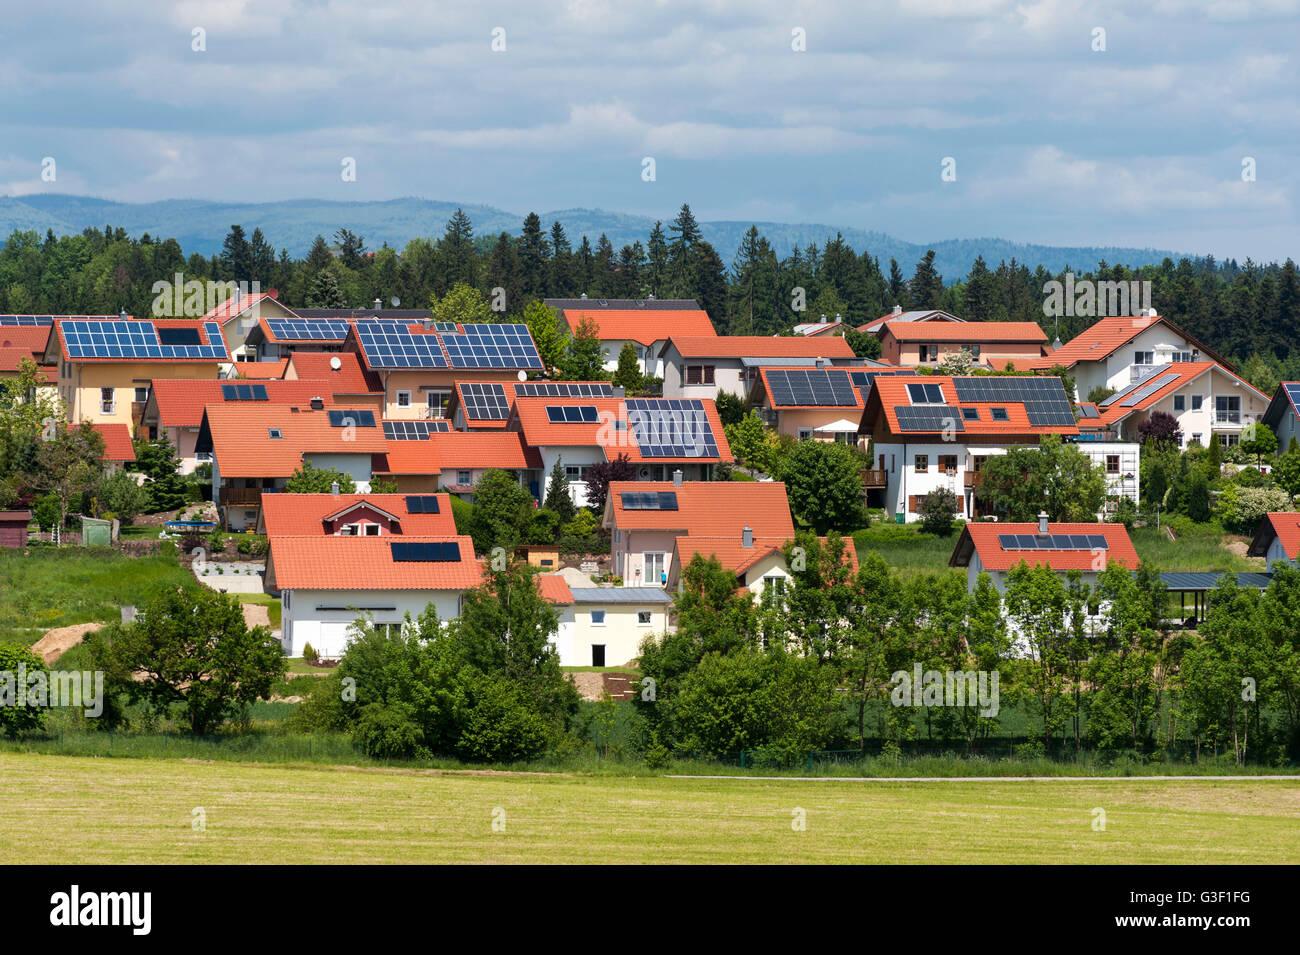 View on the landscape near Neukirchen vorm Wald, region Donau-Wald, Bavarian Forest, Lower Bavaria, Bavaria, Germany - Stock Image